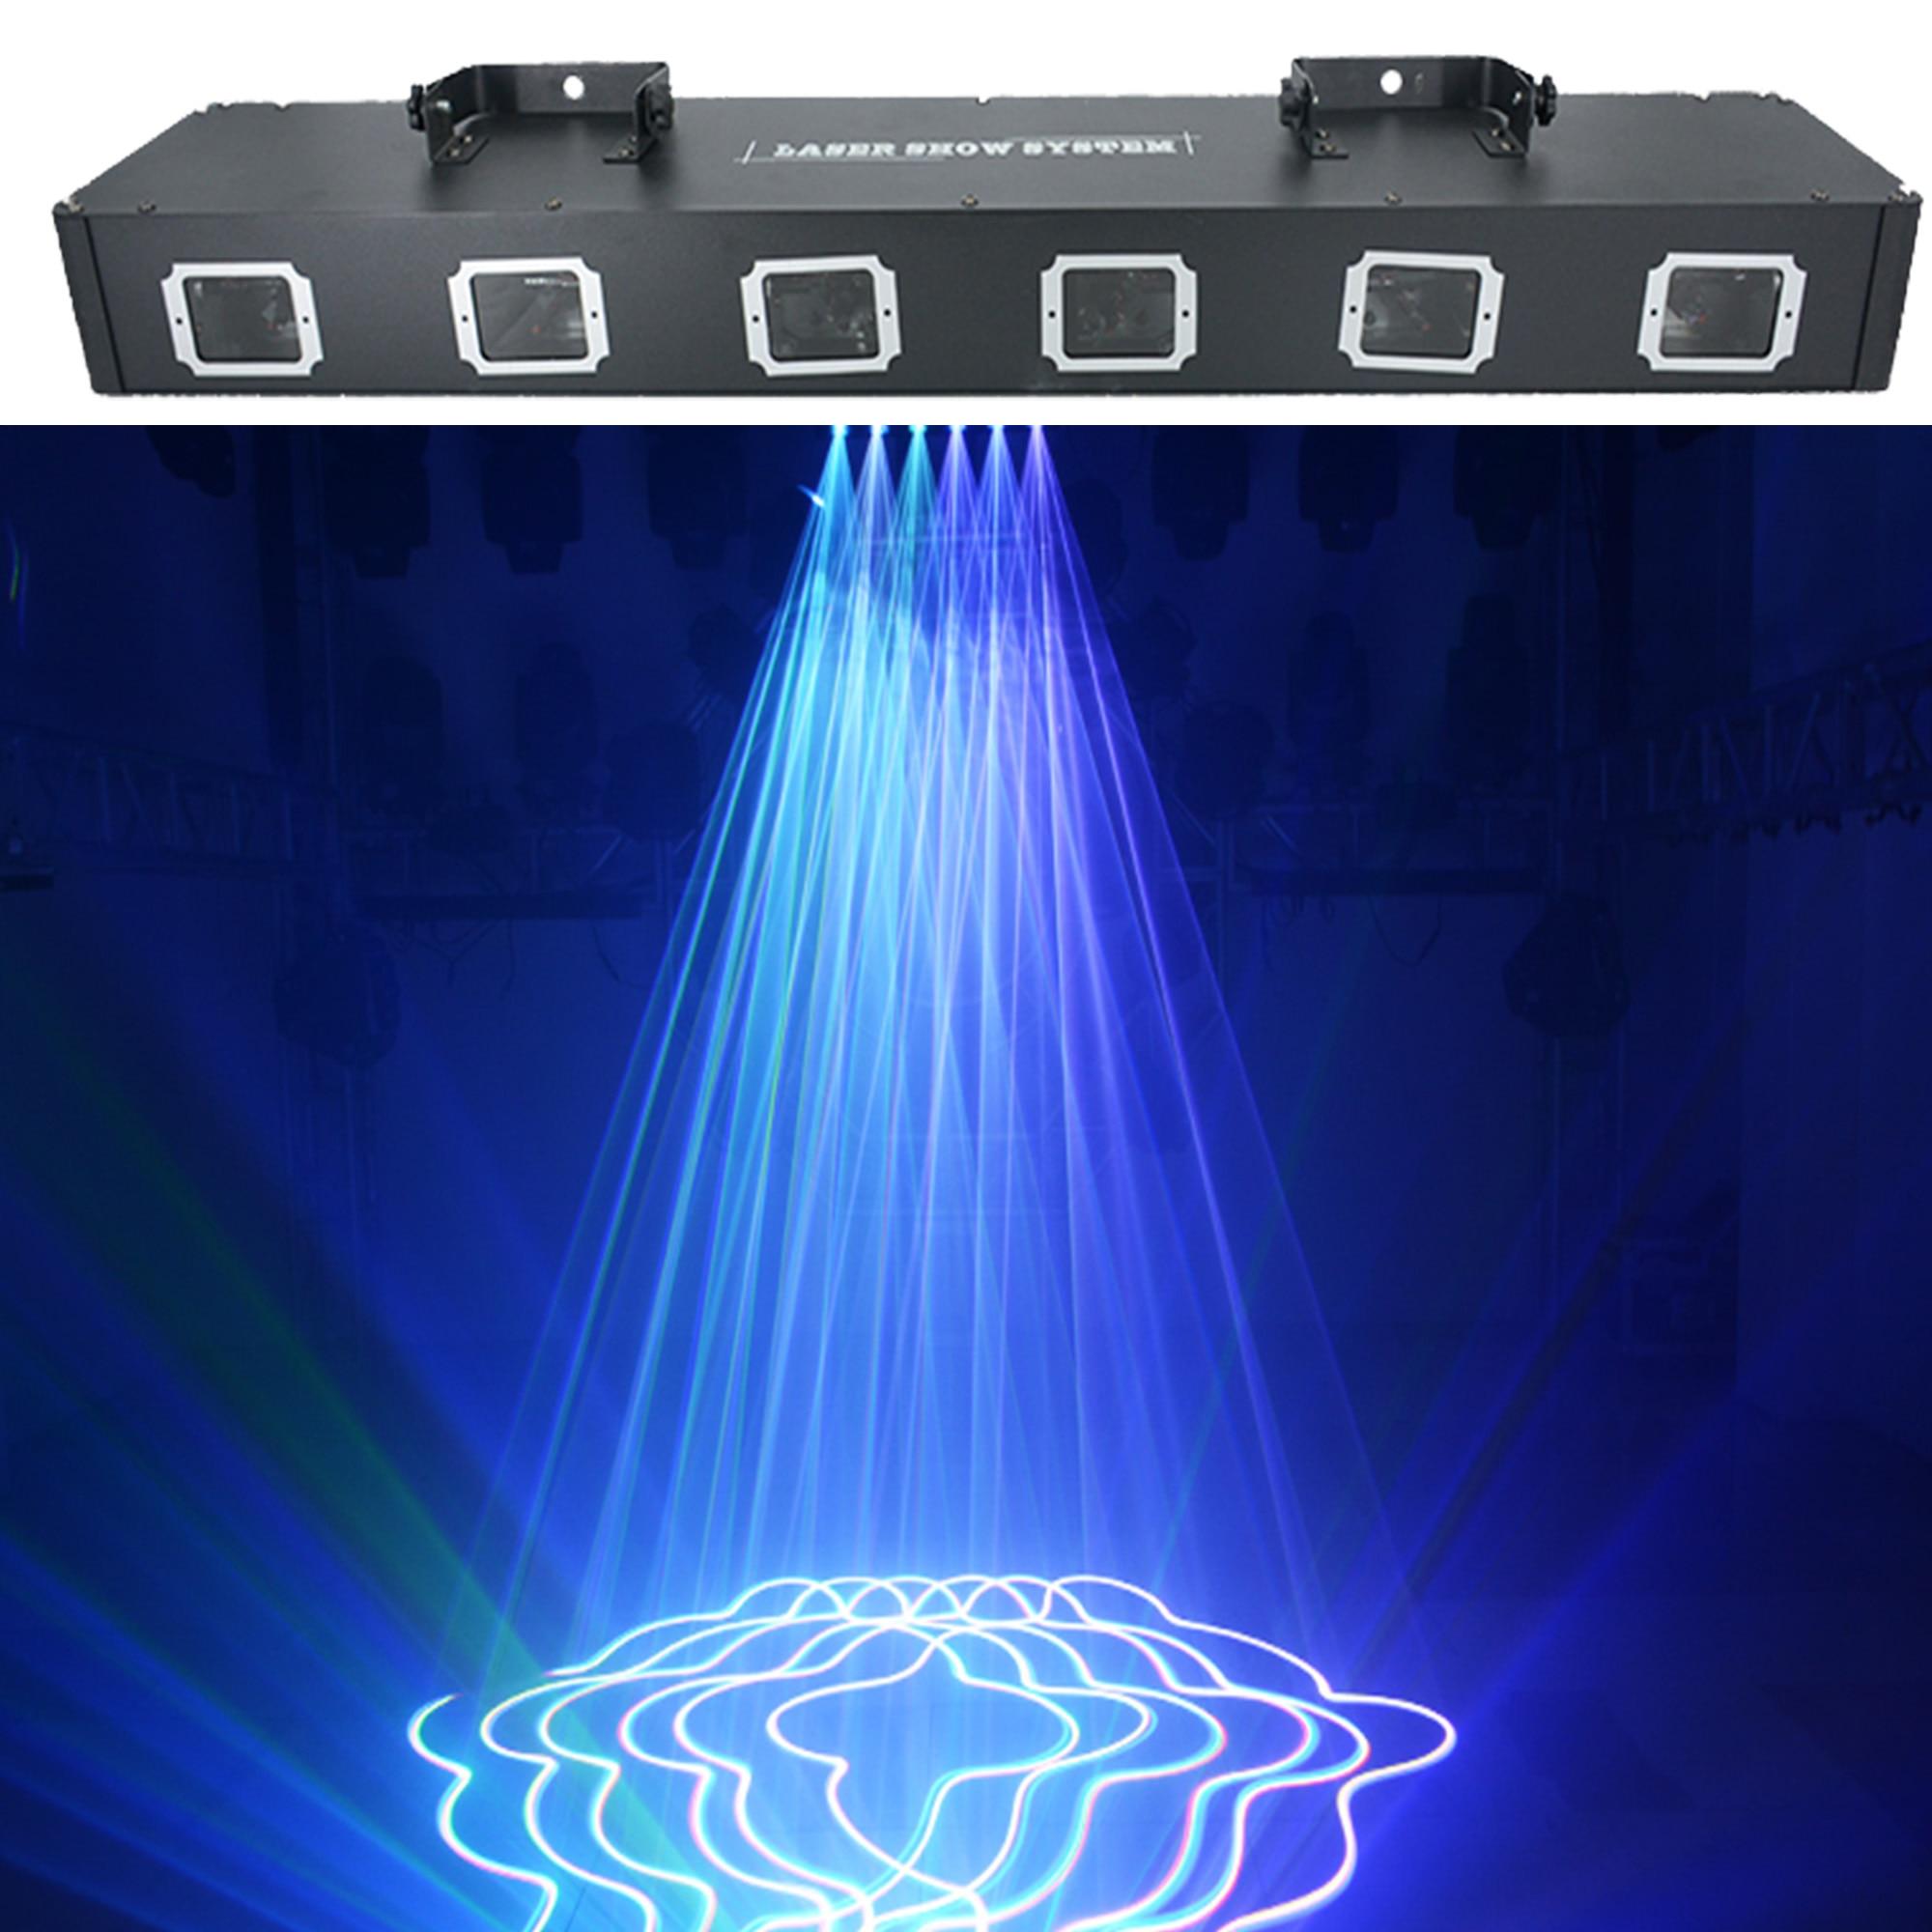 RGBY-مصباح عرض ليزر بستة رؤوس ، DMX 512 ملون ، جهاز عرض ، حفلة عيد الميلاد ، DJ ، ديسكو ، معدات رقص أرضية